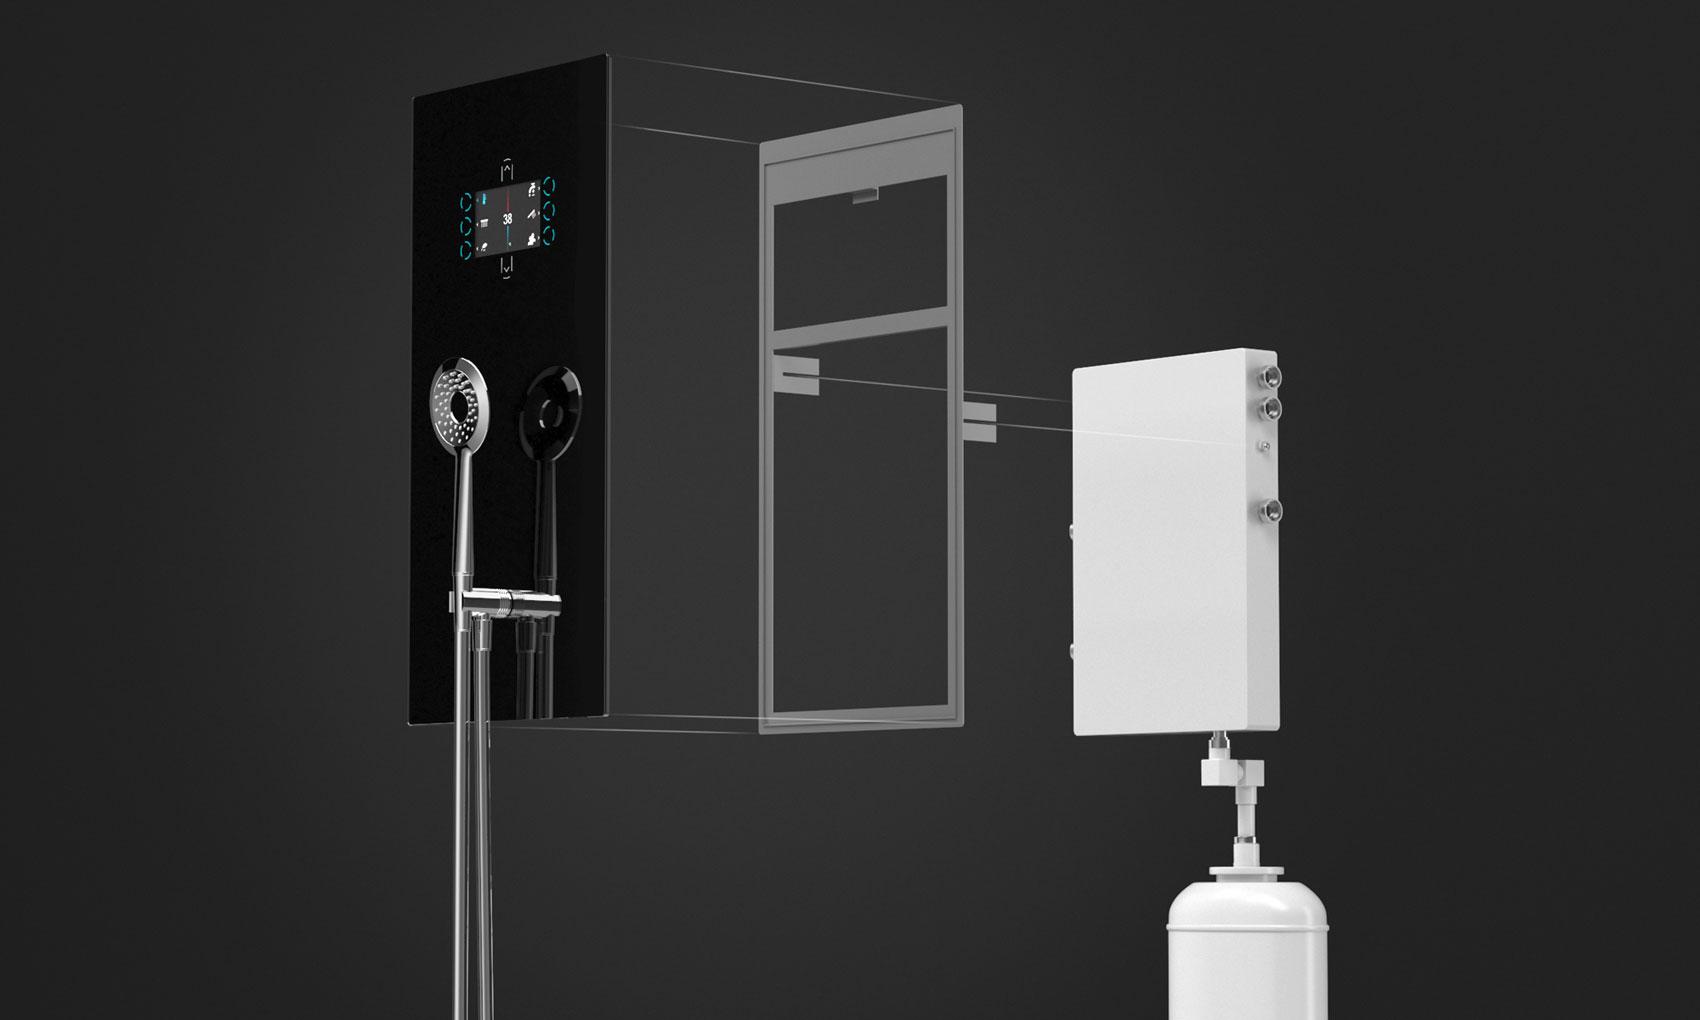 06-douche-showerpad-insens-inman